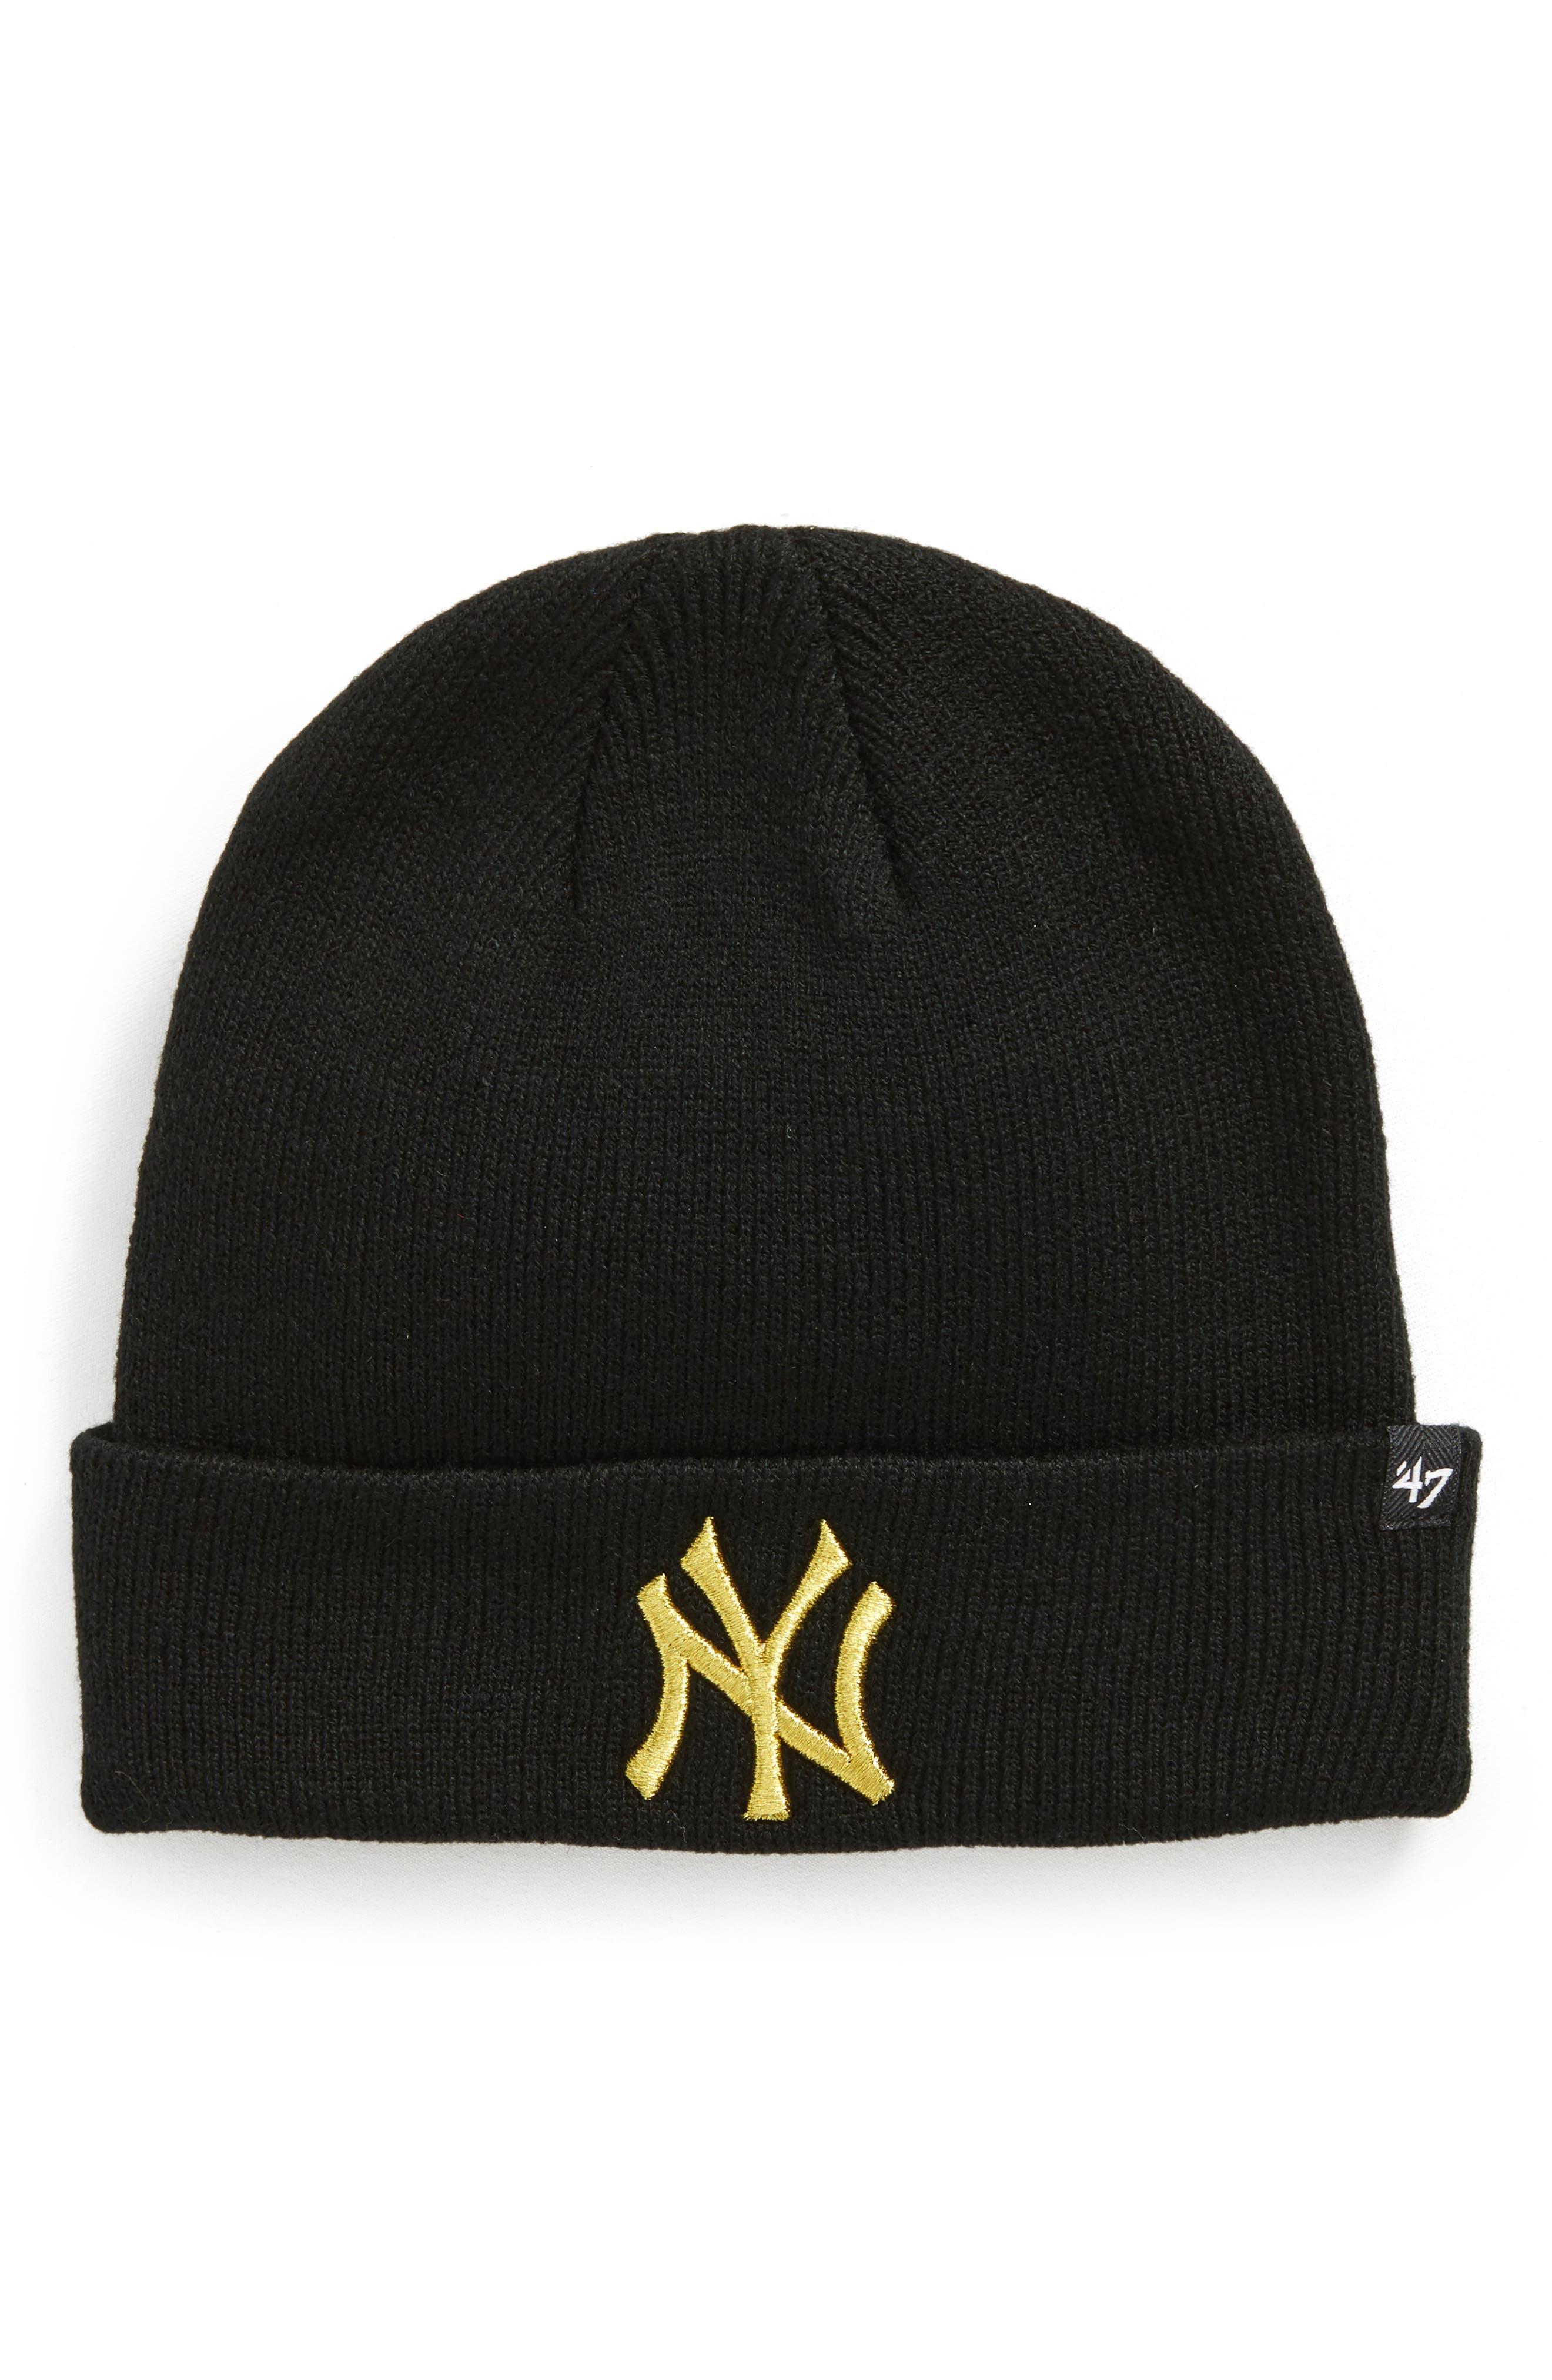 New York Yankees Metallic Beanie,                             Main thumbnail 1, color,                             Black